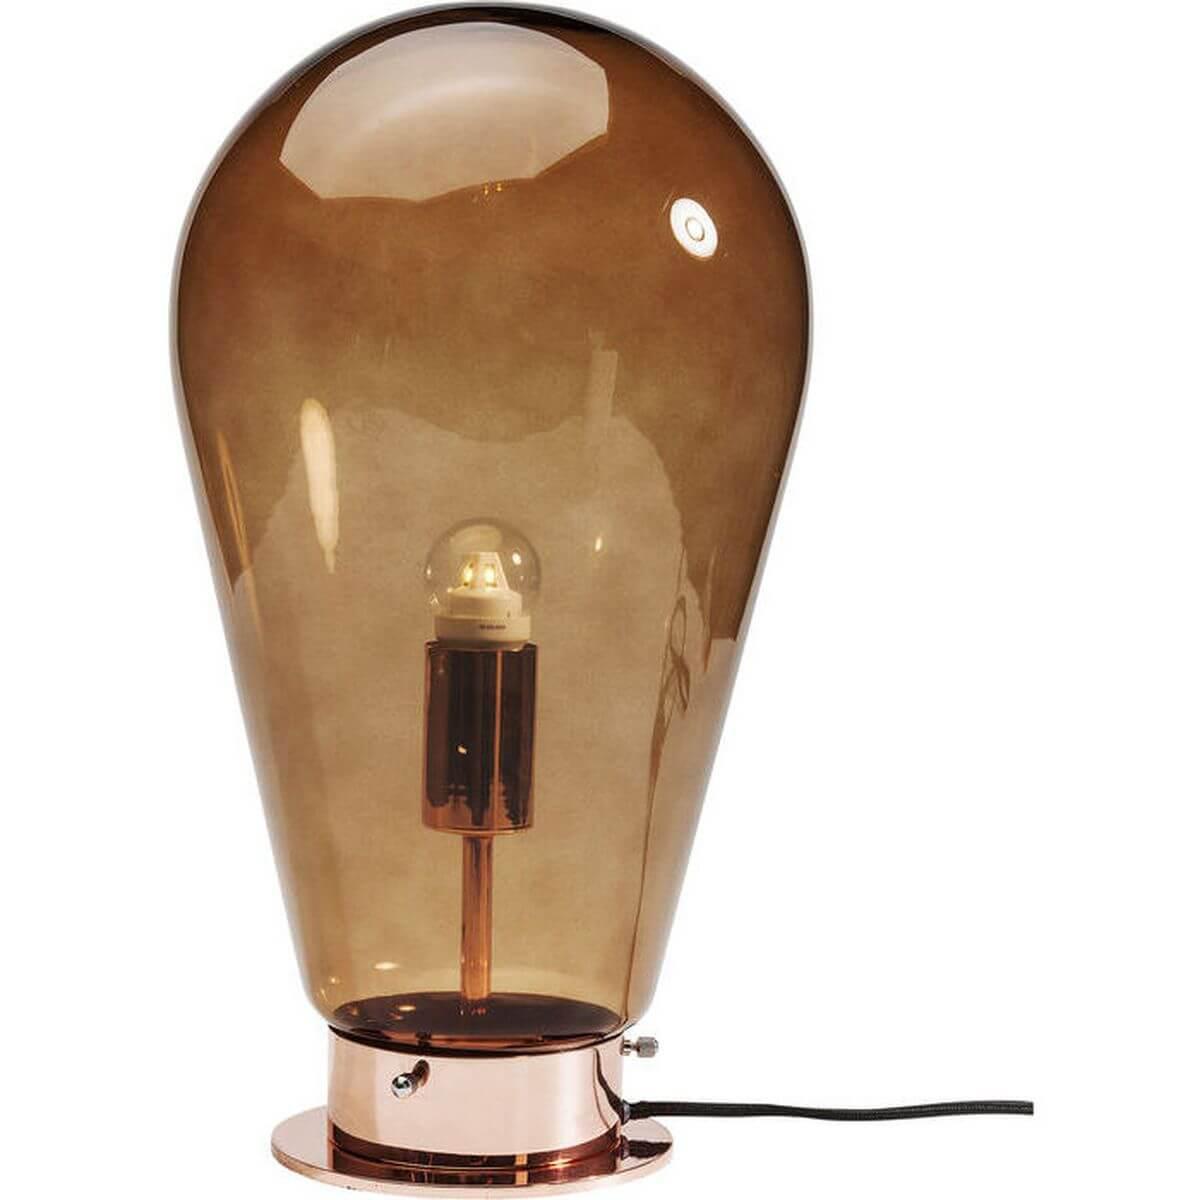 Lampe à poser BULB Kare Design cuivre